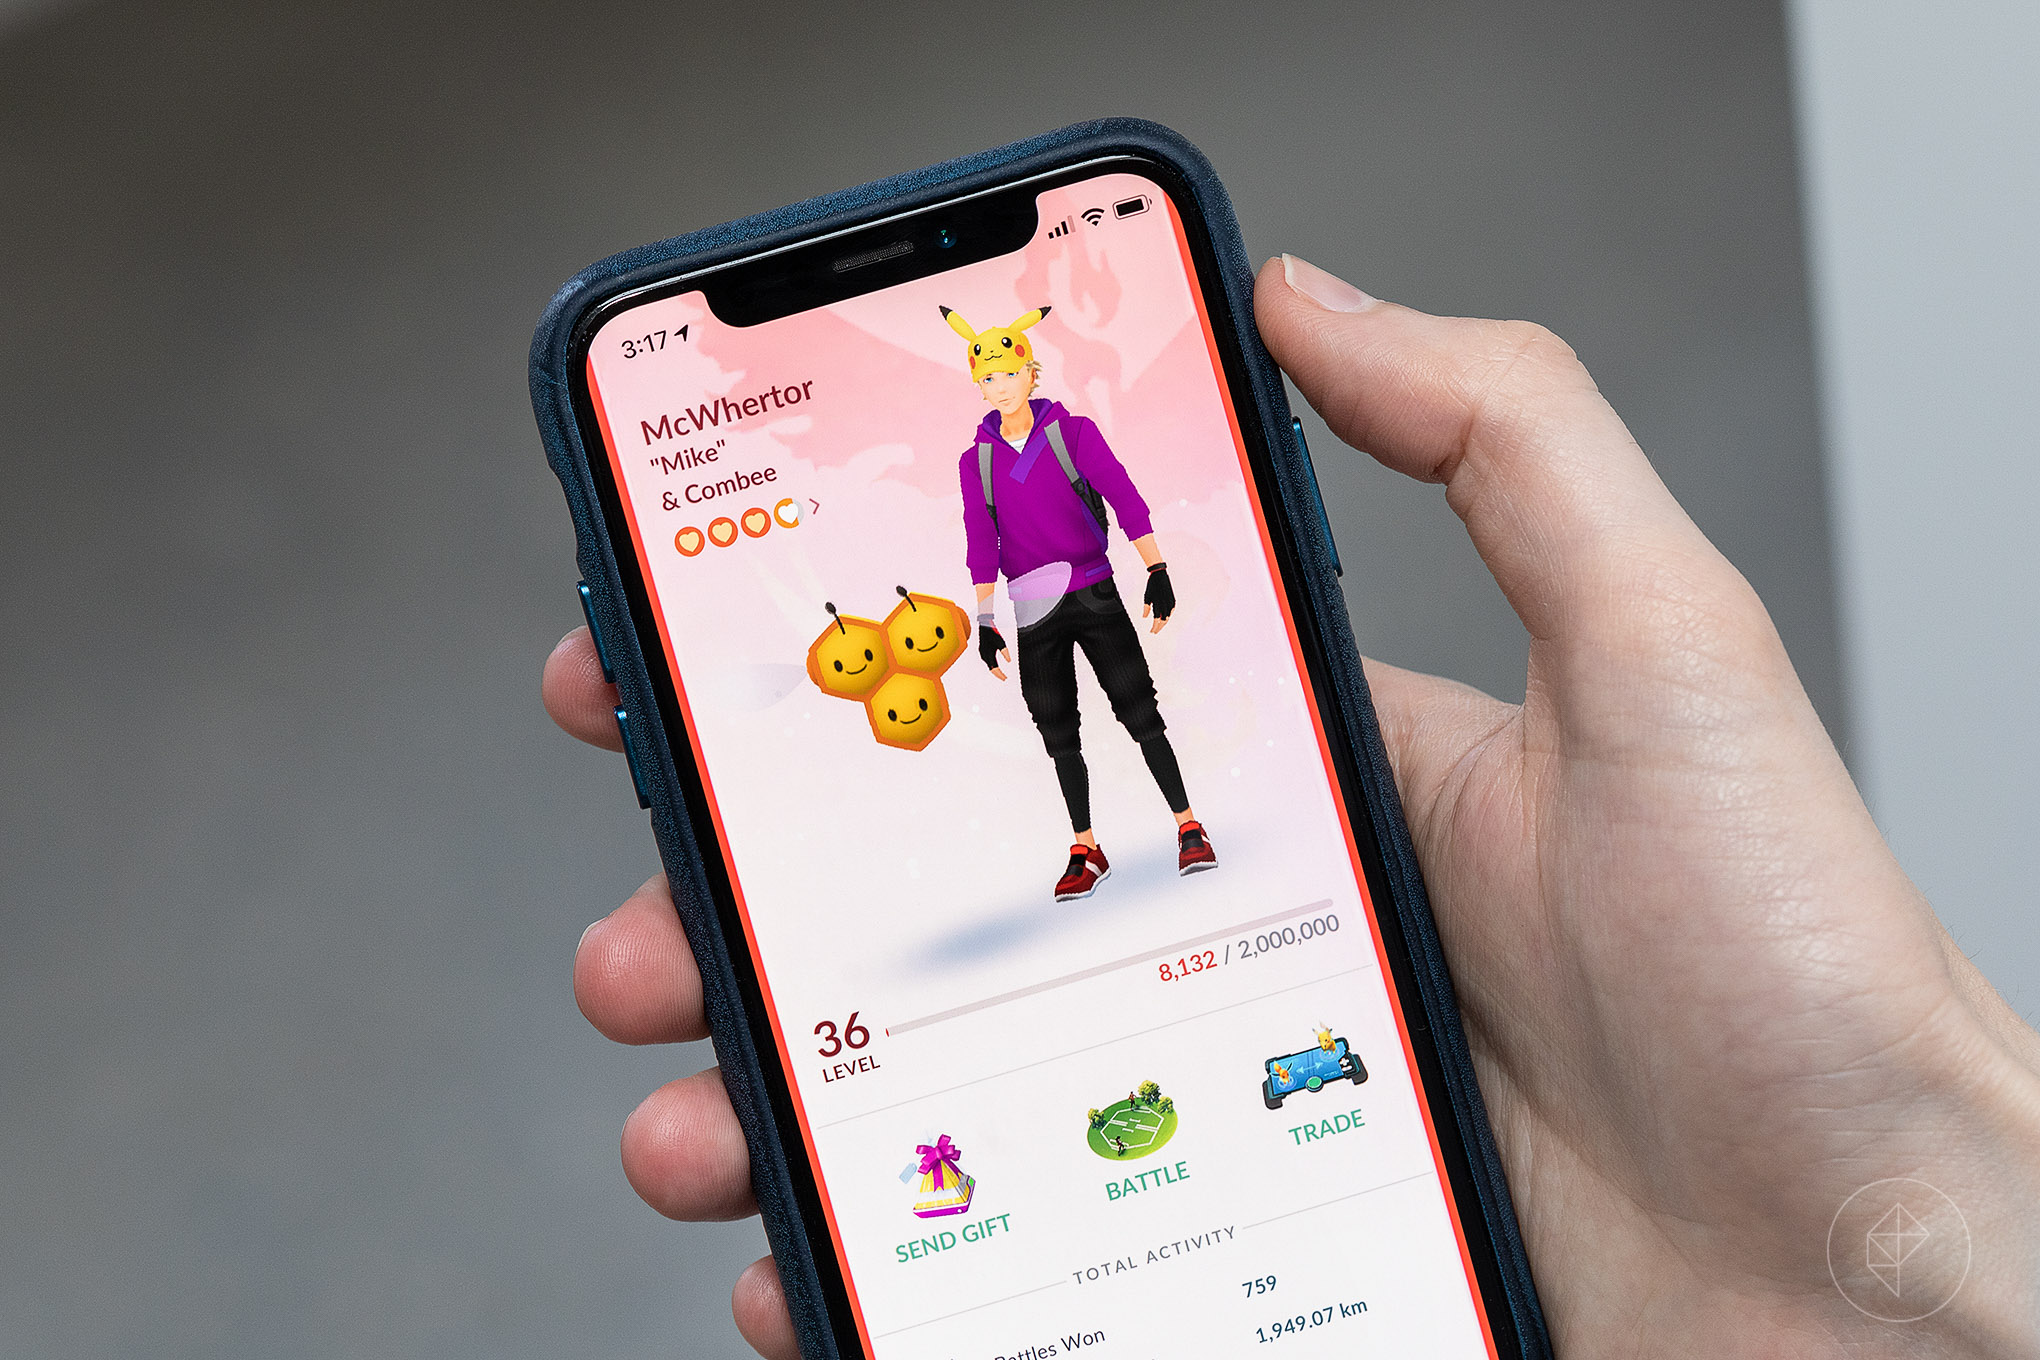 Pokémon Go friendship guide: How to get Lucky Friends